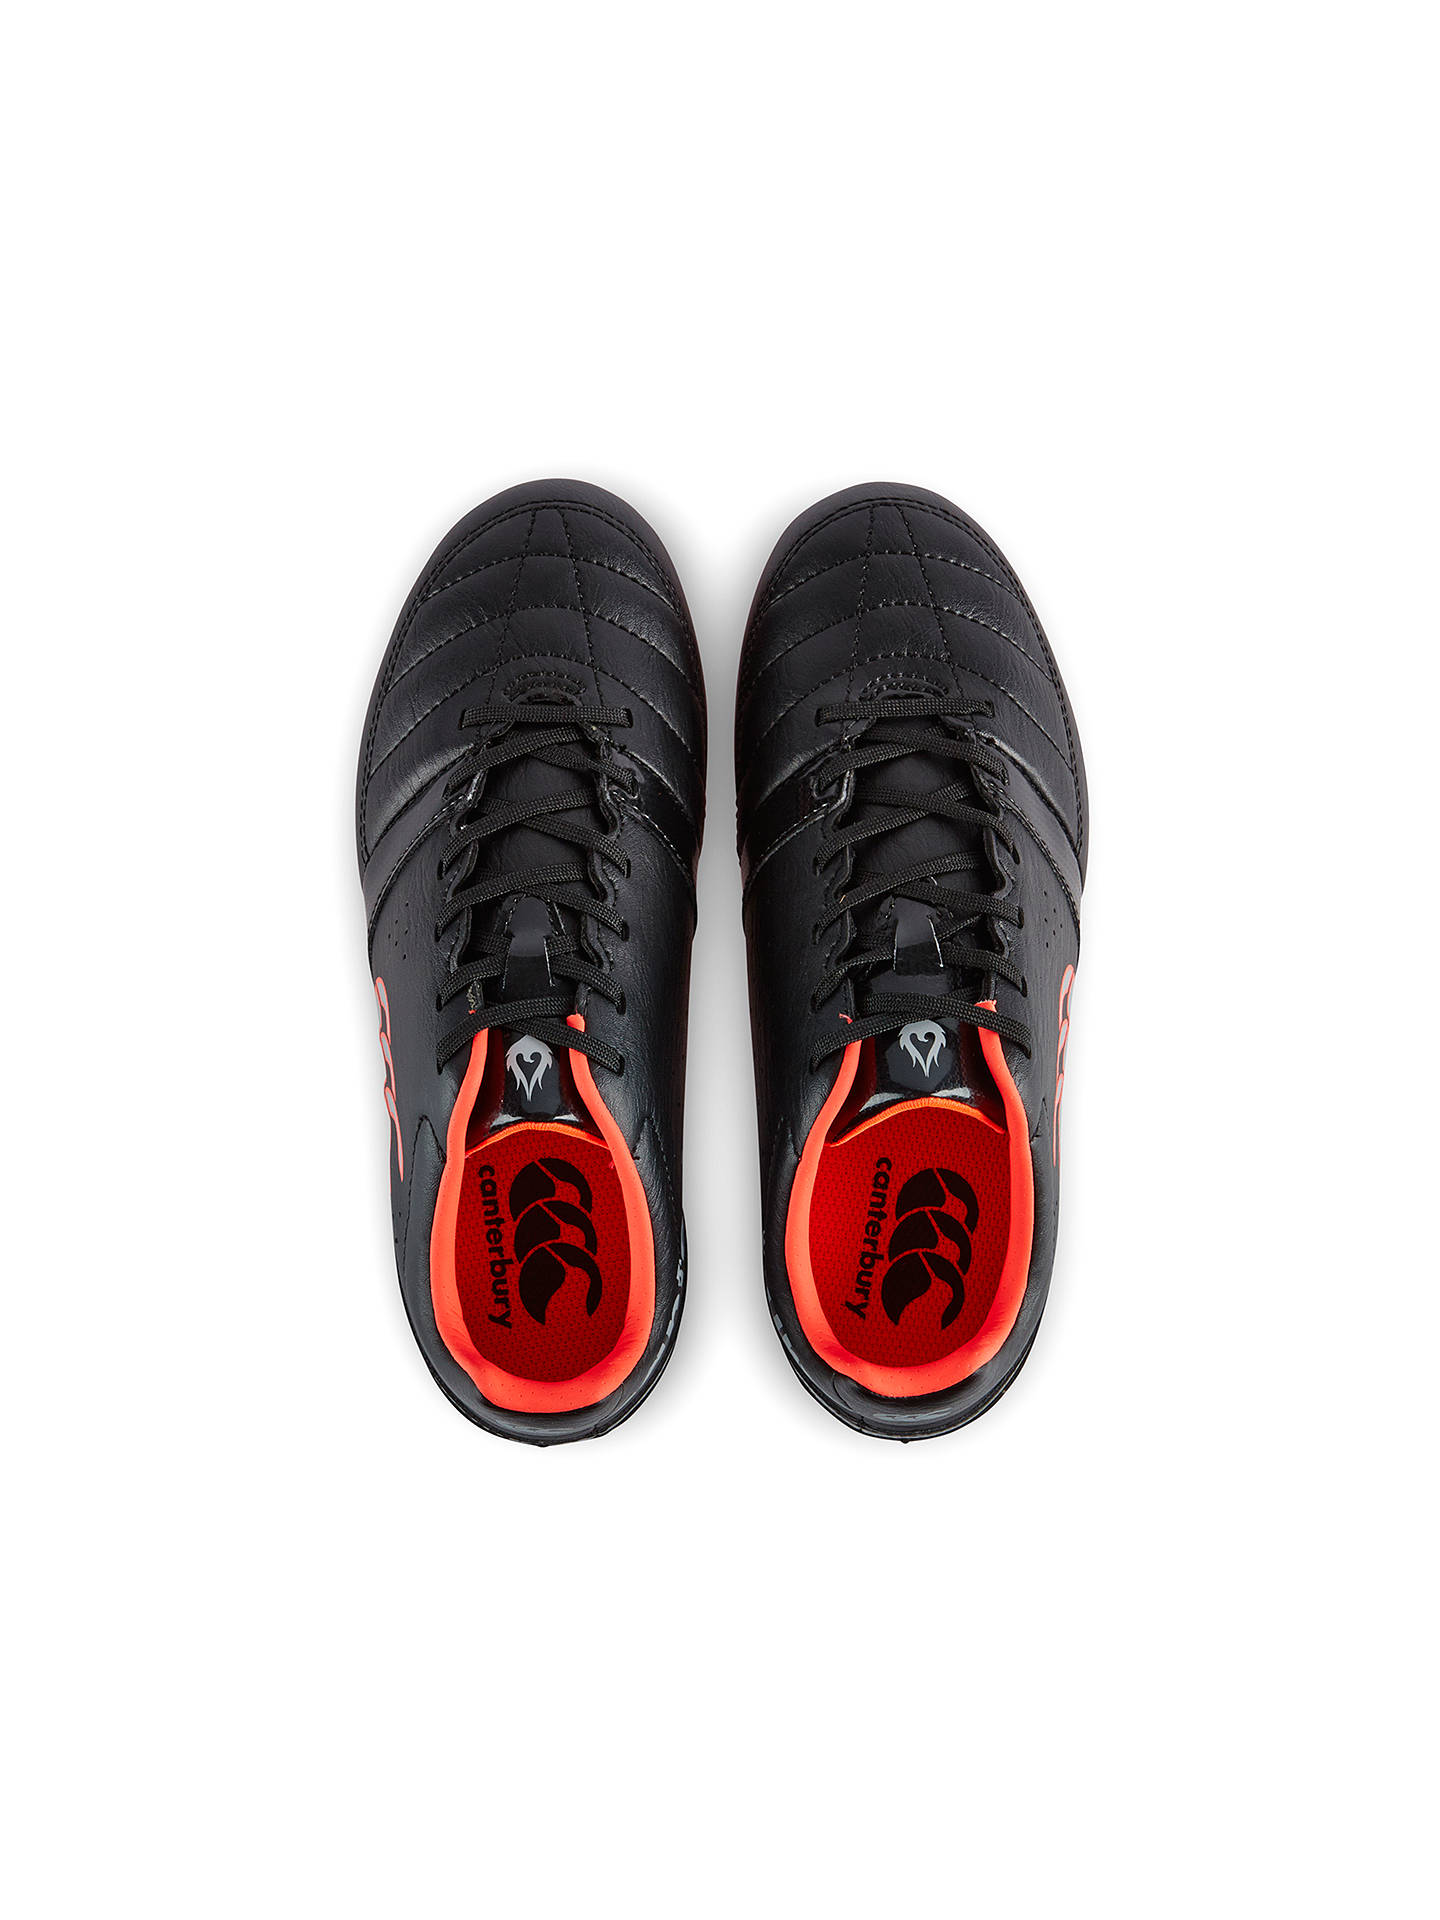 Chaussures de Football Mixte Enfant Gola Aka016